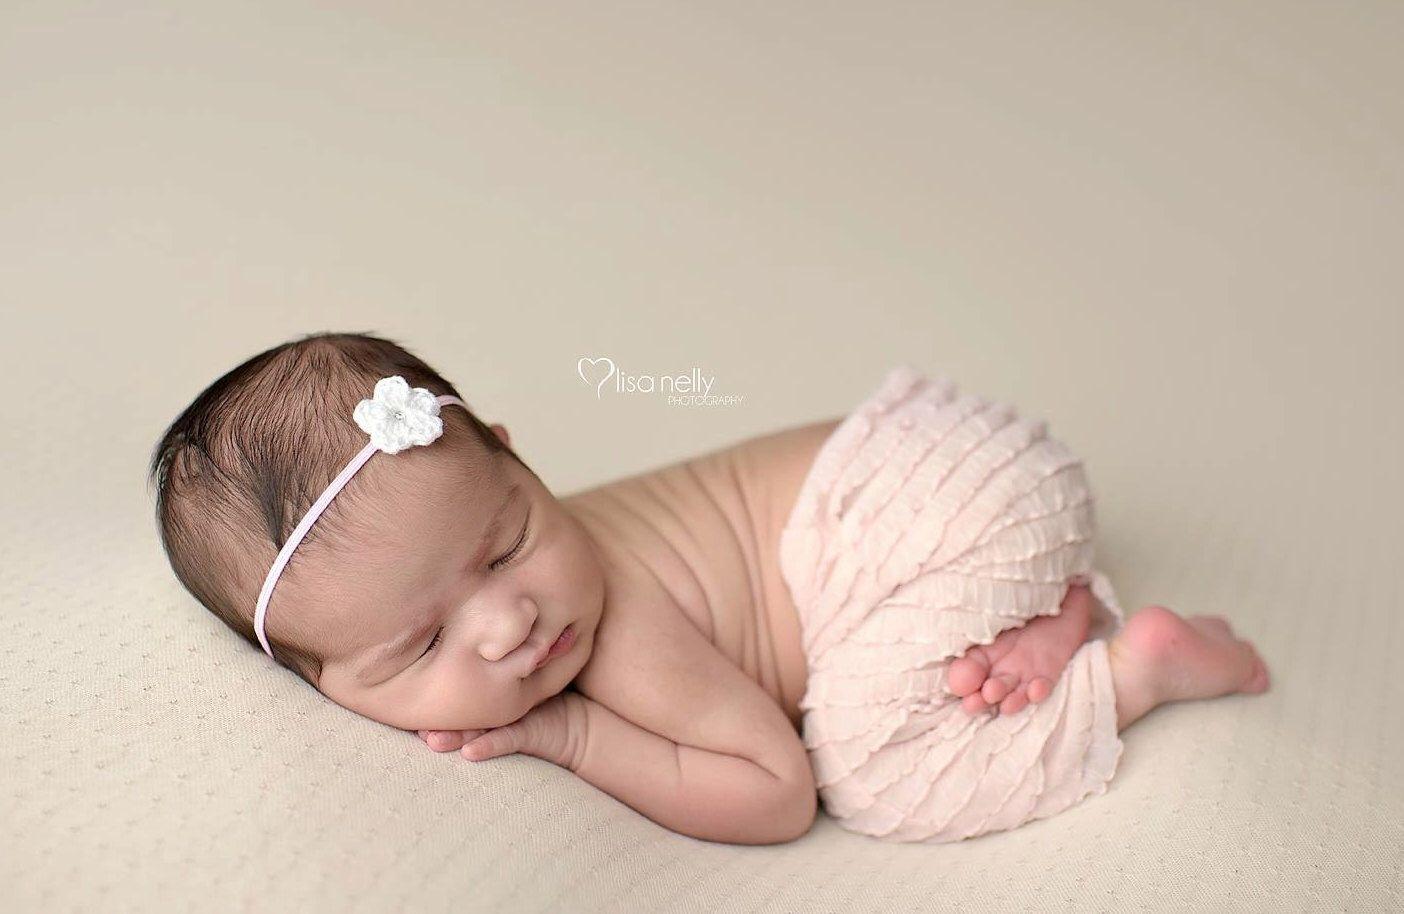 Newborn Pant, Ruffle Leggings, Newborn Photo Props, Baby Headband, Newborn Girl Photo Outfit, Ruffle Pants, Newborn Take Home Outfit by BabyGraceHats on Etsy https://www.etsy.com/listing/250067248/newborn-pant-ruffle-leggings-newborn